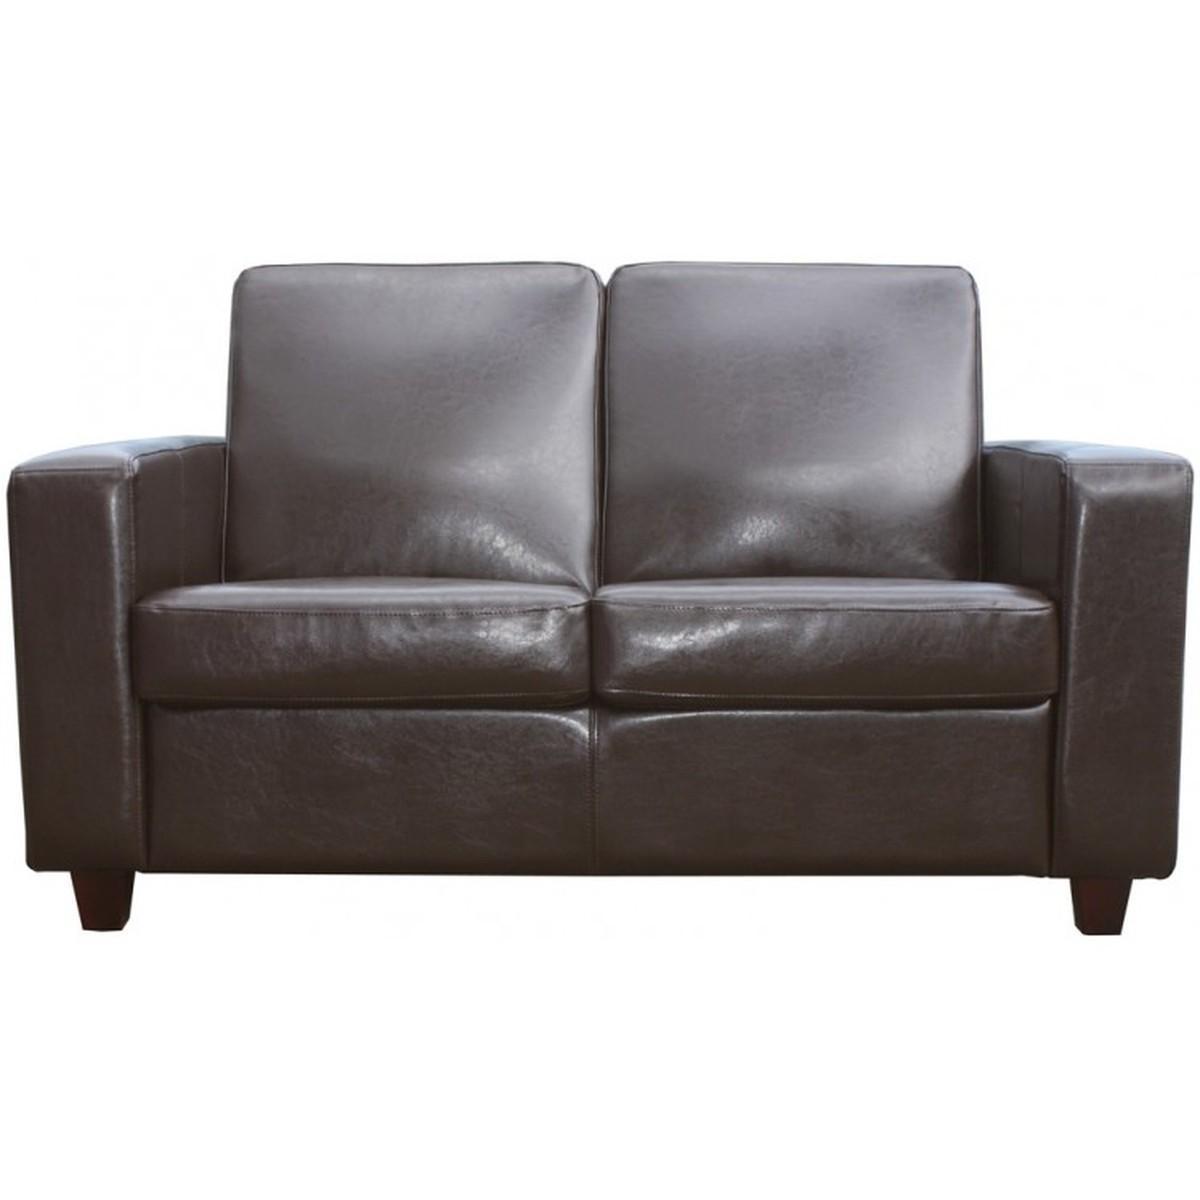 commercial sofas and chairs metal garden 20 photos sofa ideas